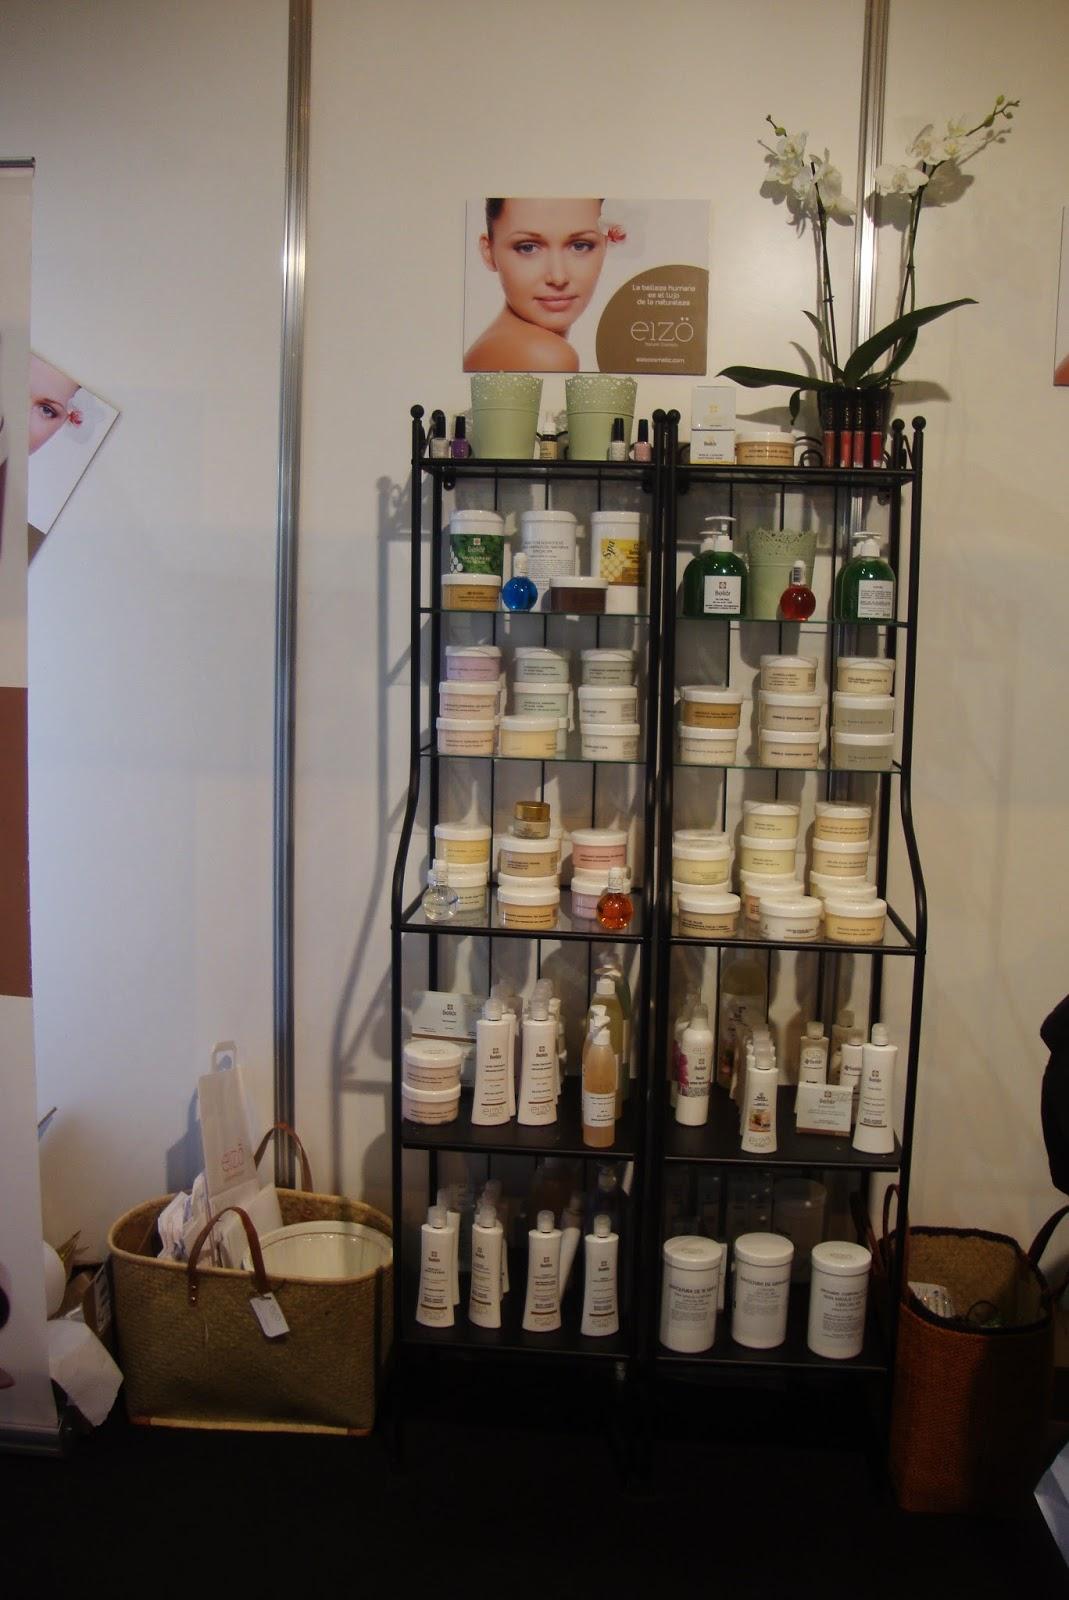 eizo cosmetics